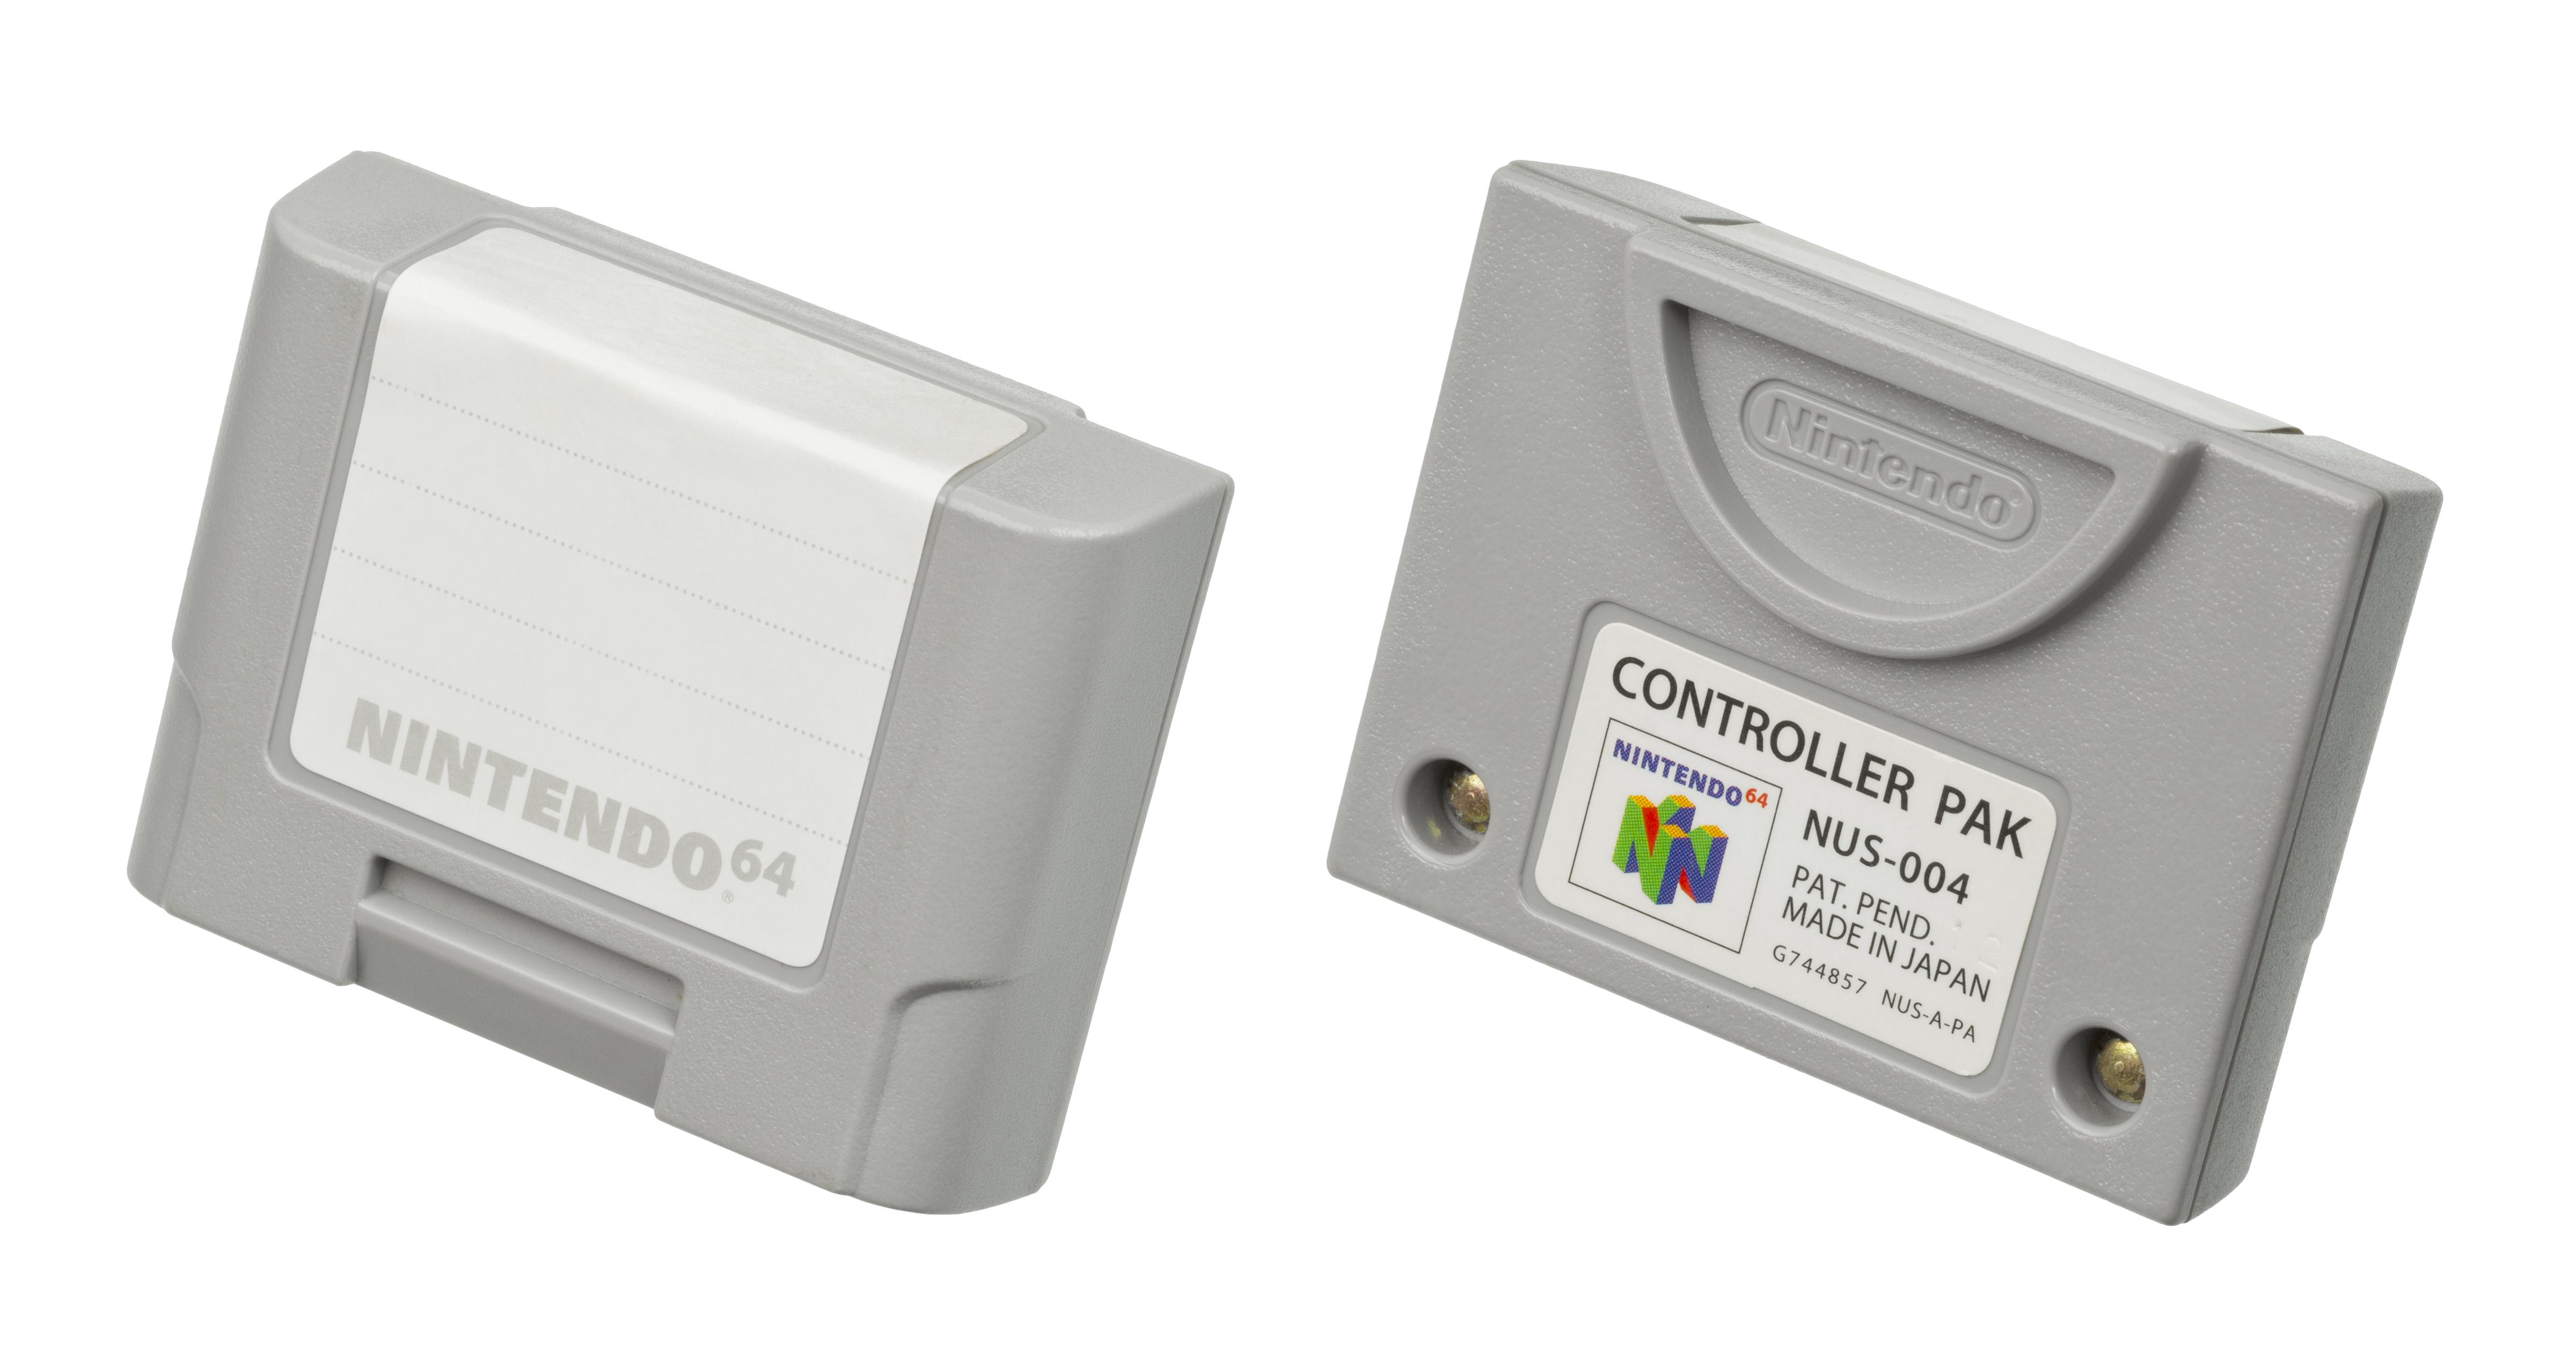 File:Nintendo-64-Controller-Pak jpg - Wikimedia Commons